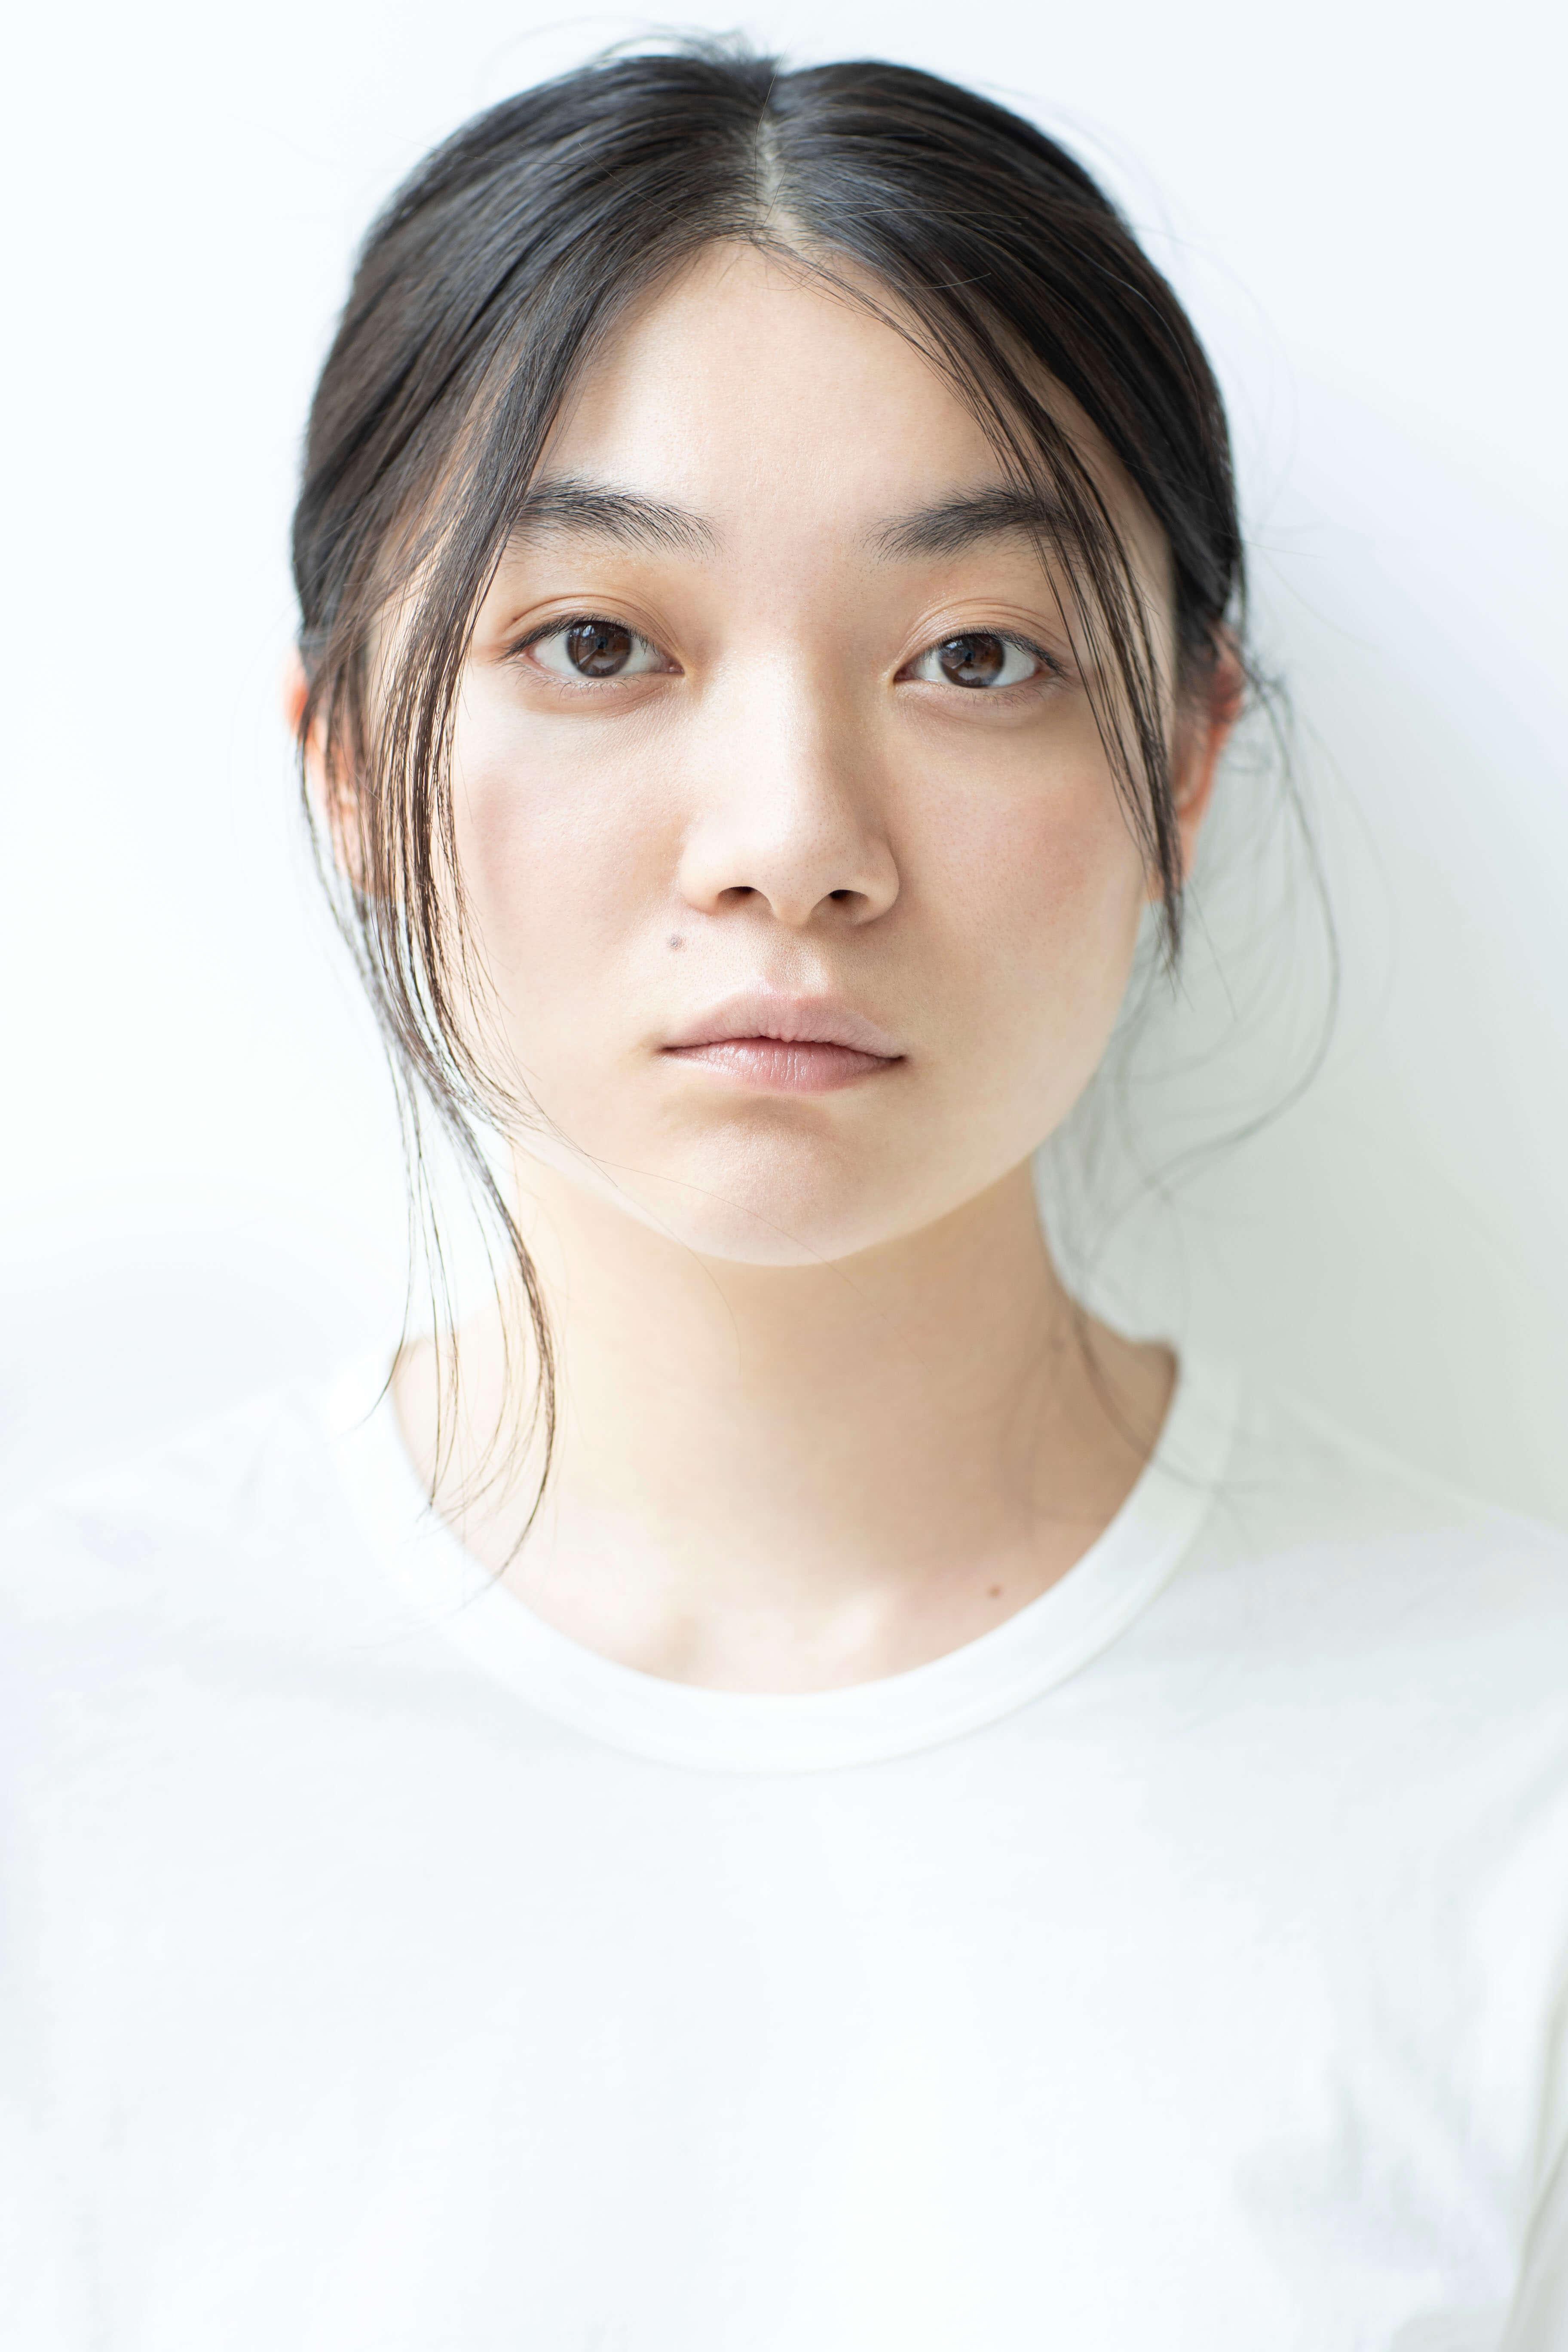 RADWIMPS 天気の子 新海誠 三浦透子 Makoto Shinkai Tenki no ko Toko Miura 三浦透子main